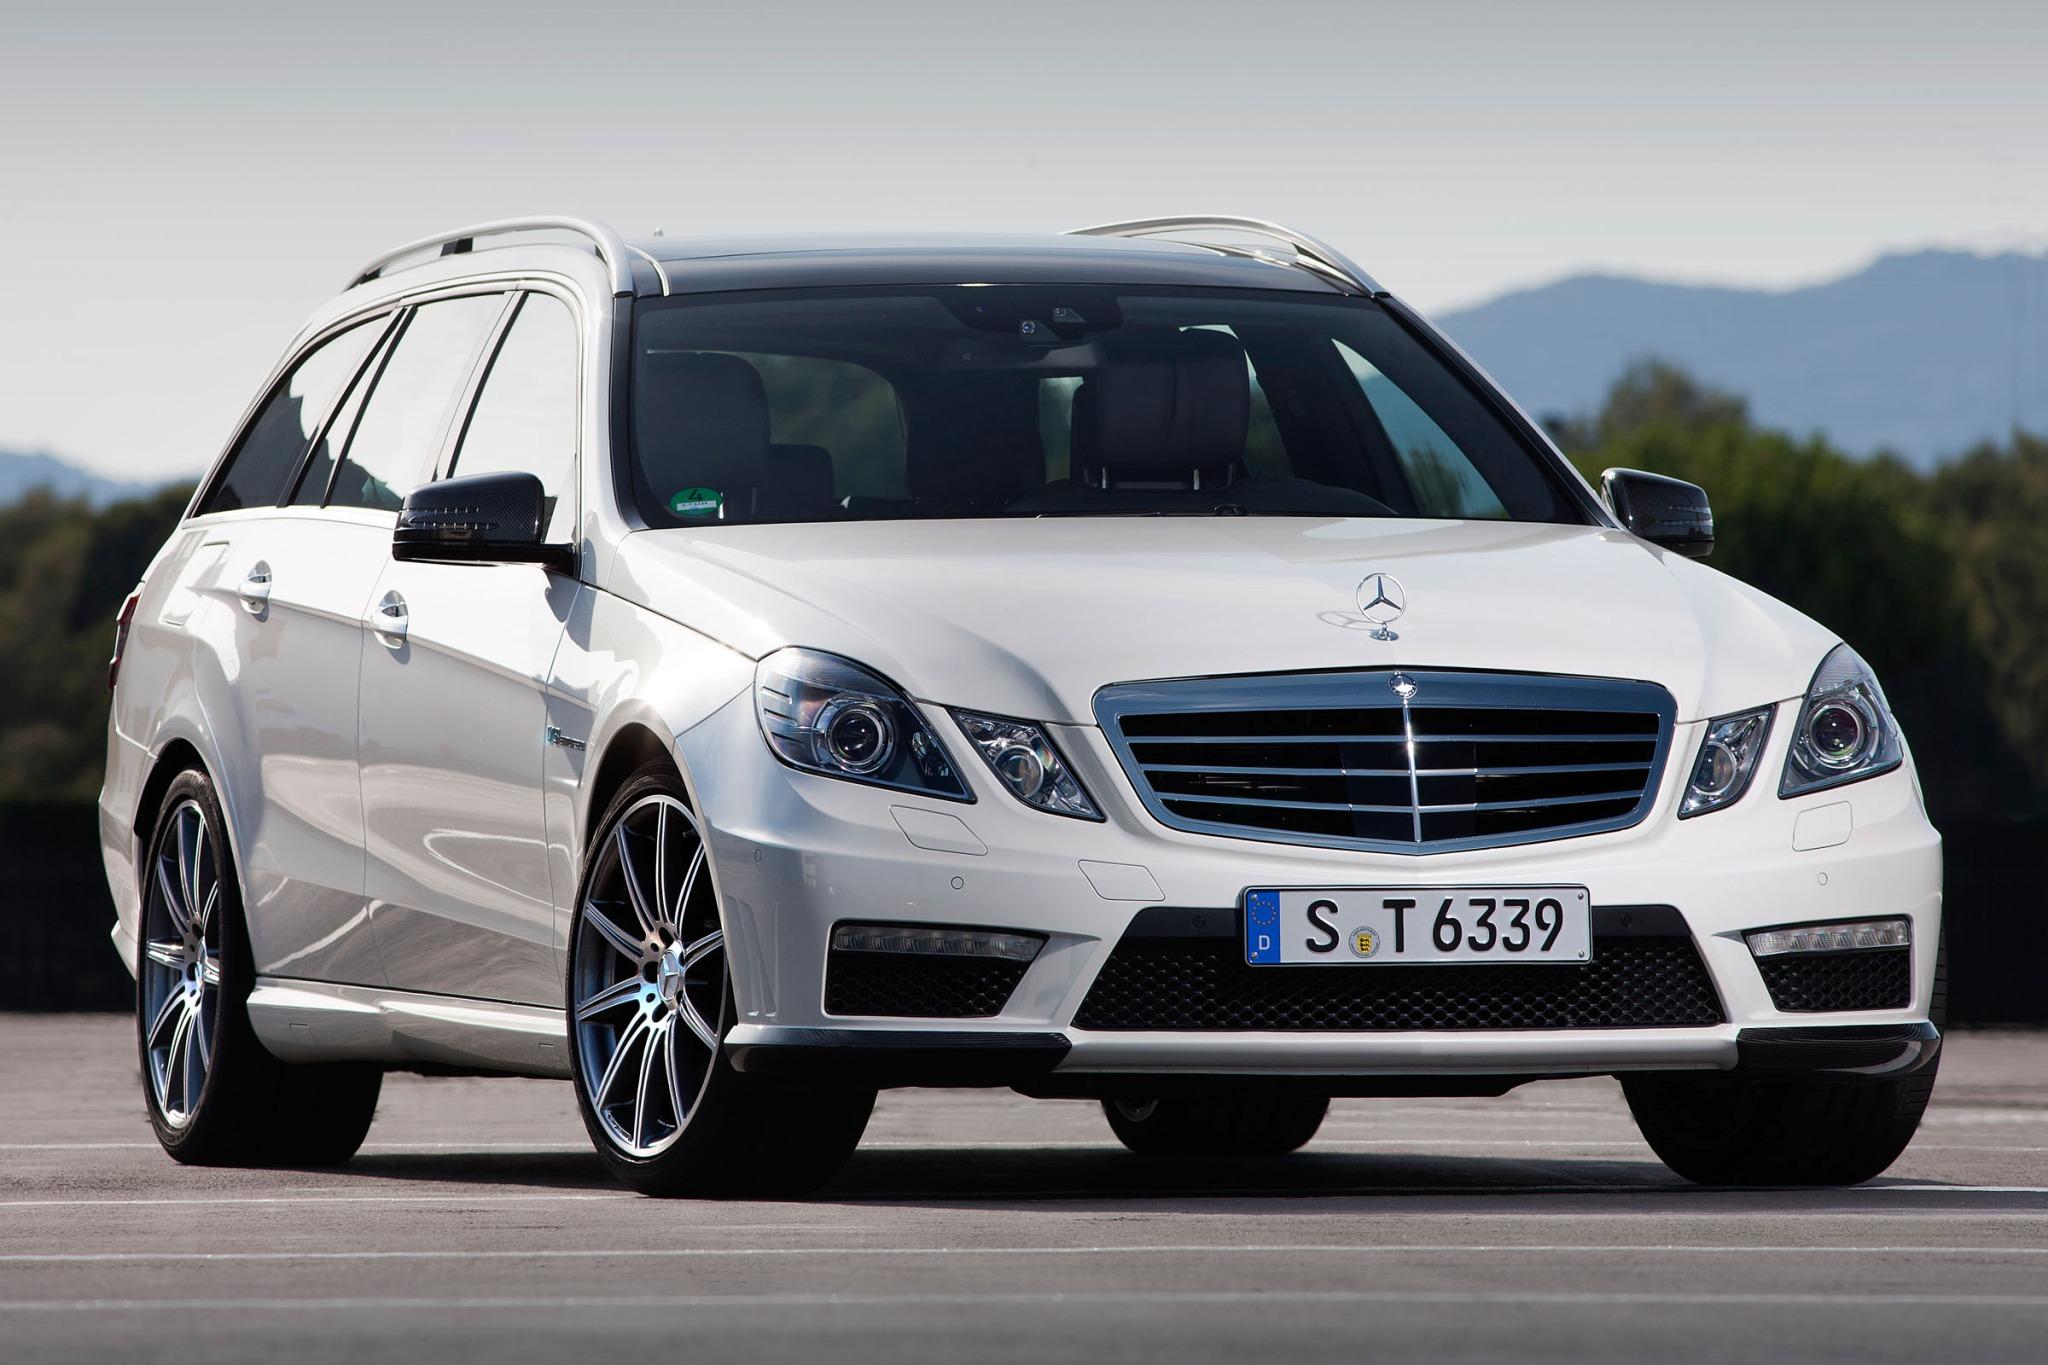 2013 Mercedes Benz E Class Image 1